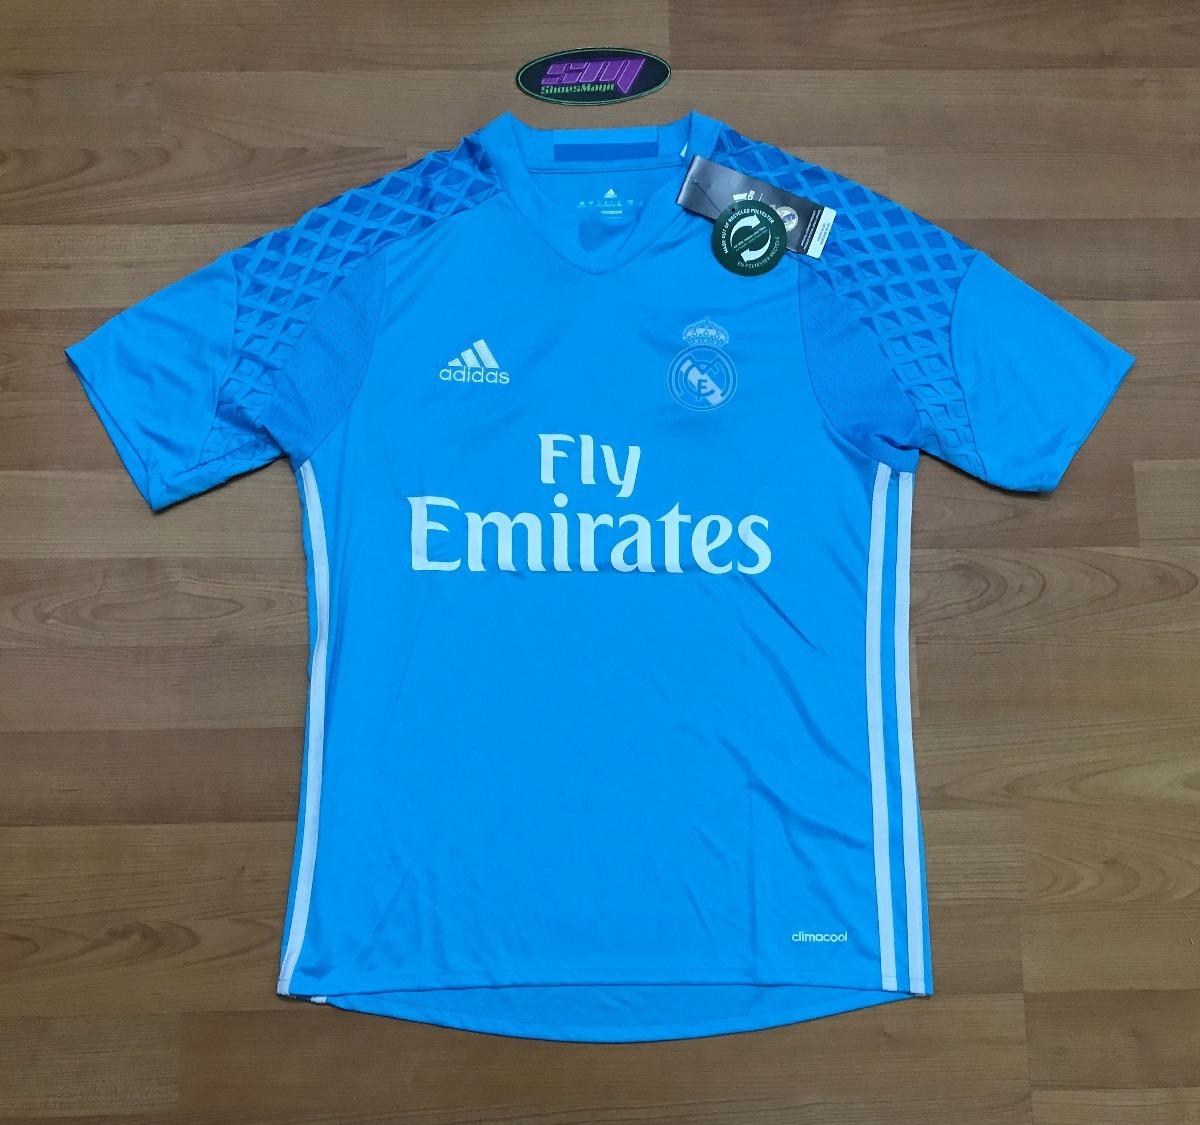 641aaf21b5d51 Playera adidas Del Real Madrid Para Niño Portero -   349.00 en ...